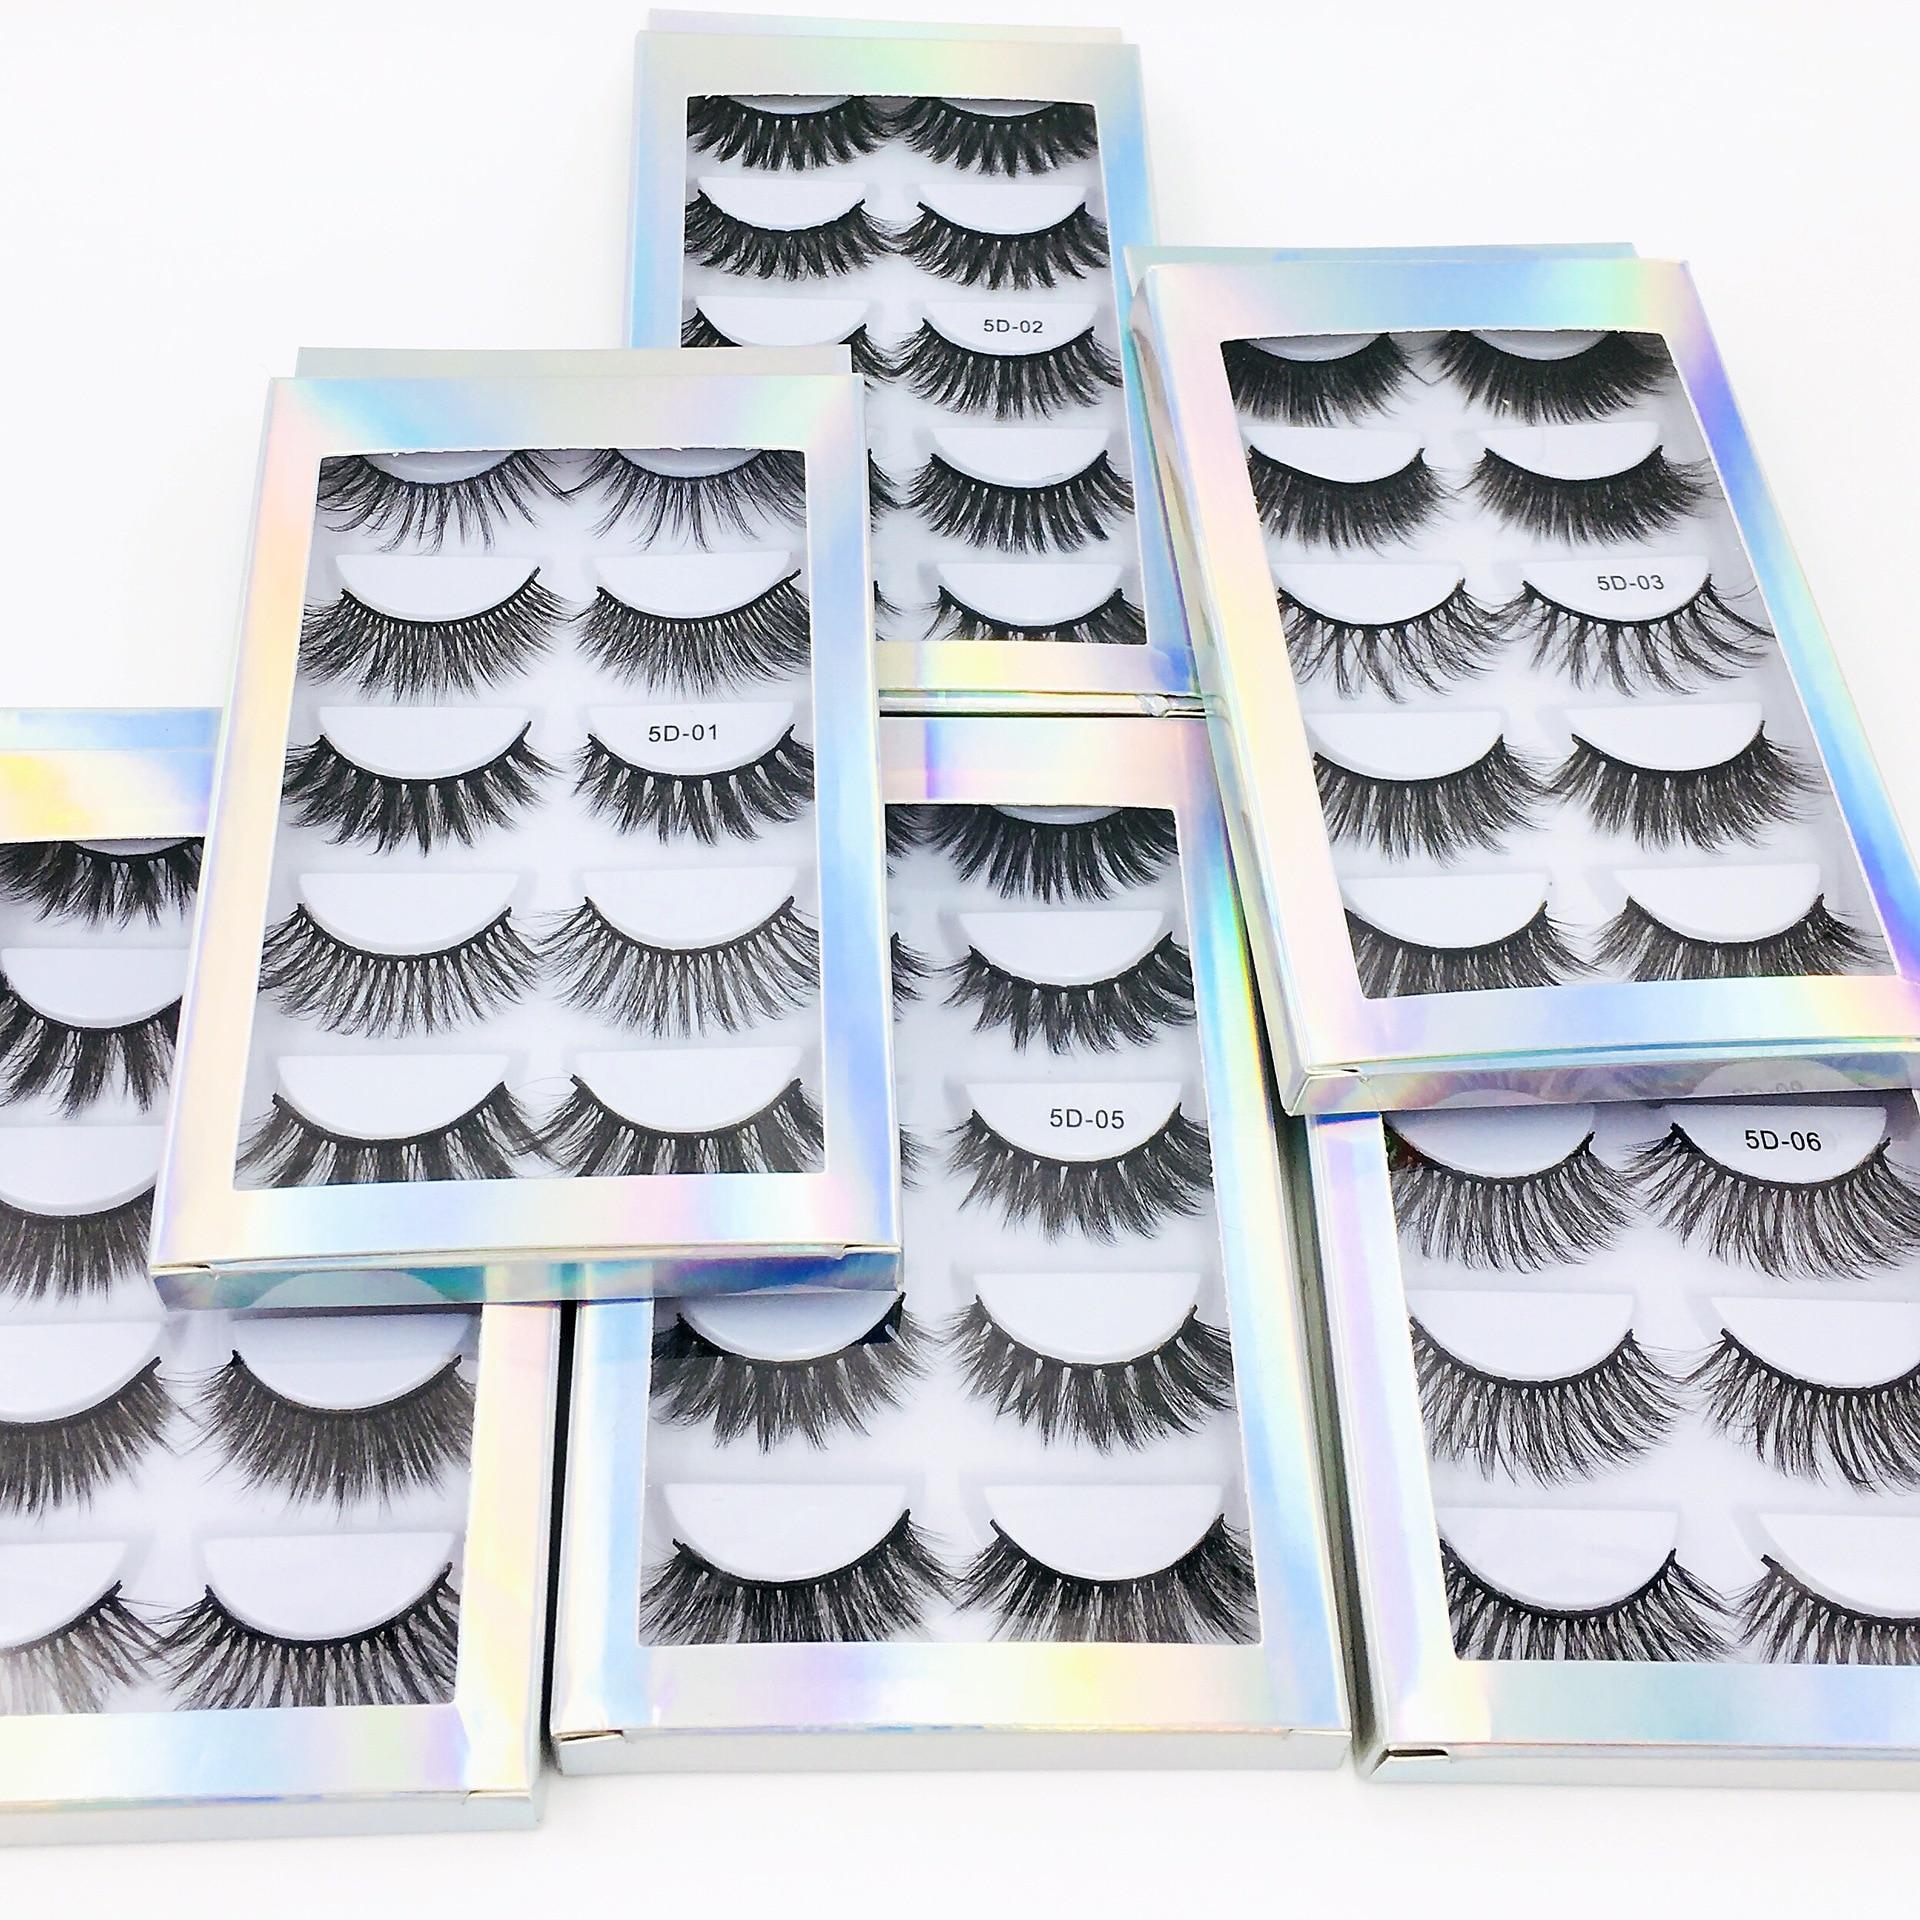 5 Pairs 3d Faux Mink False Eyelashes Thick Volume Natural For Beauty Makeup Extension Fake Eyelashes Strip Lashes Laser Box